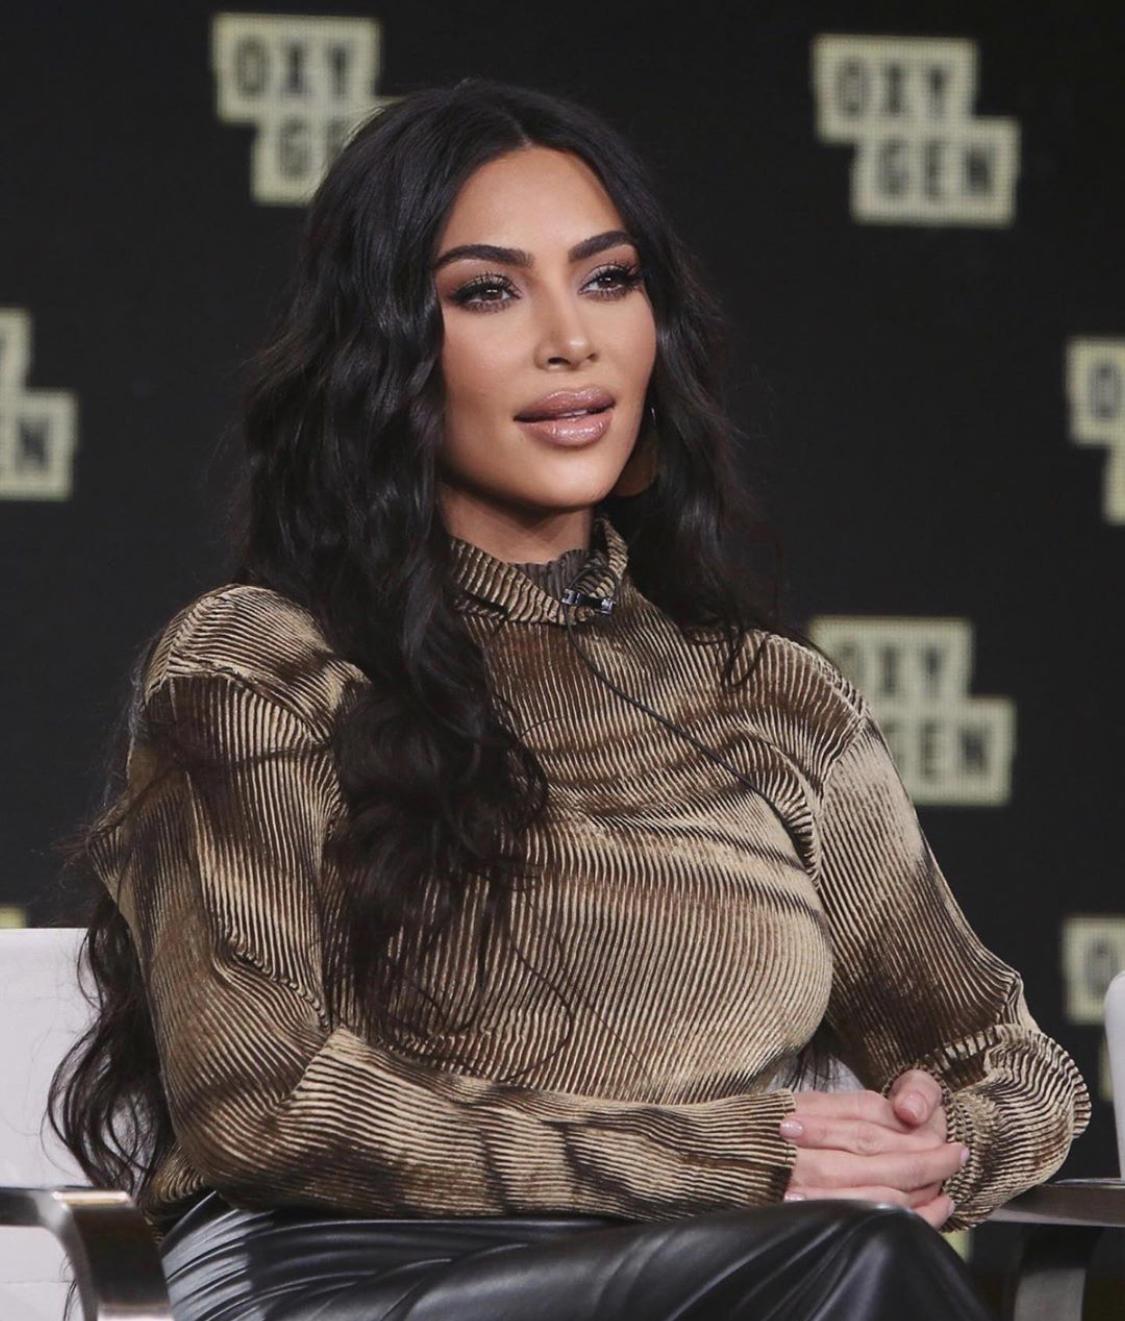 Kim Kardashian West Could Now Be Worth $900 Million